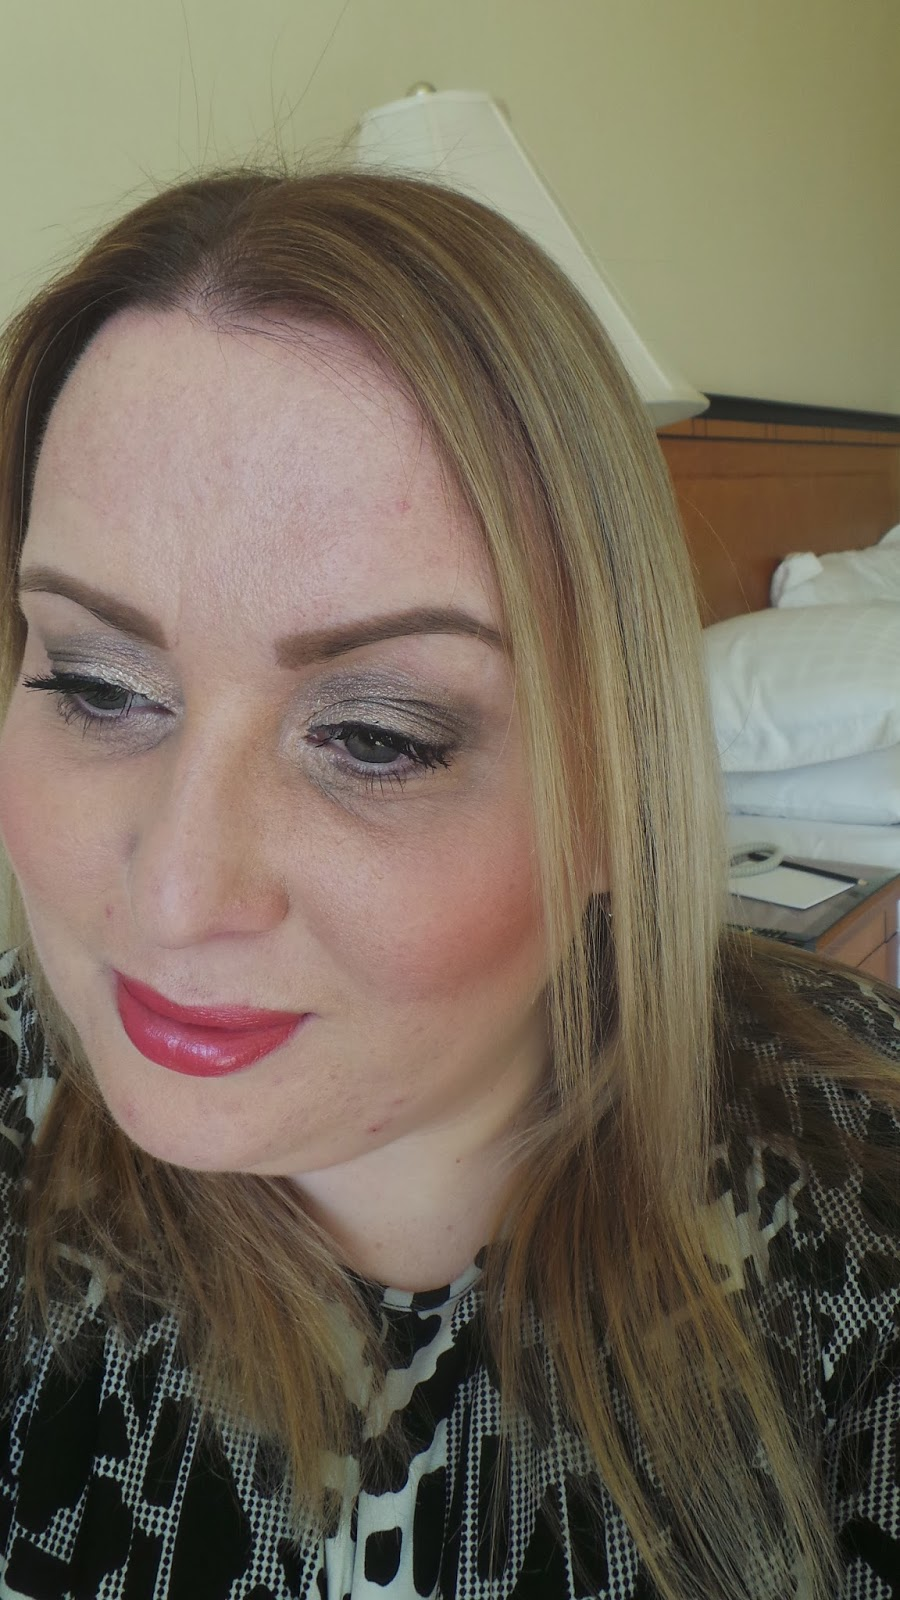 Charlotte Tilbury Cheek to Chic Swish and Pop Blusher-First Love